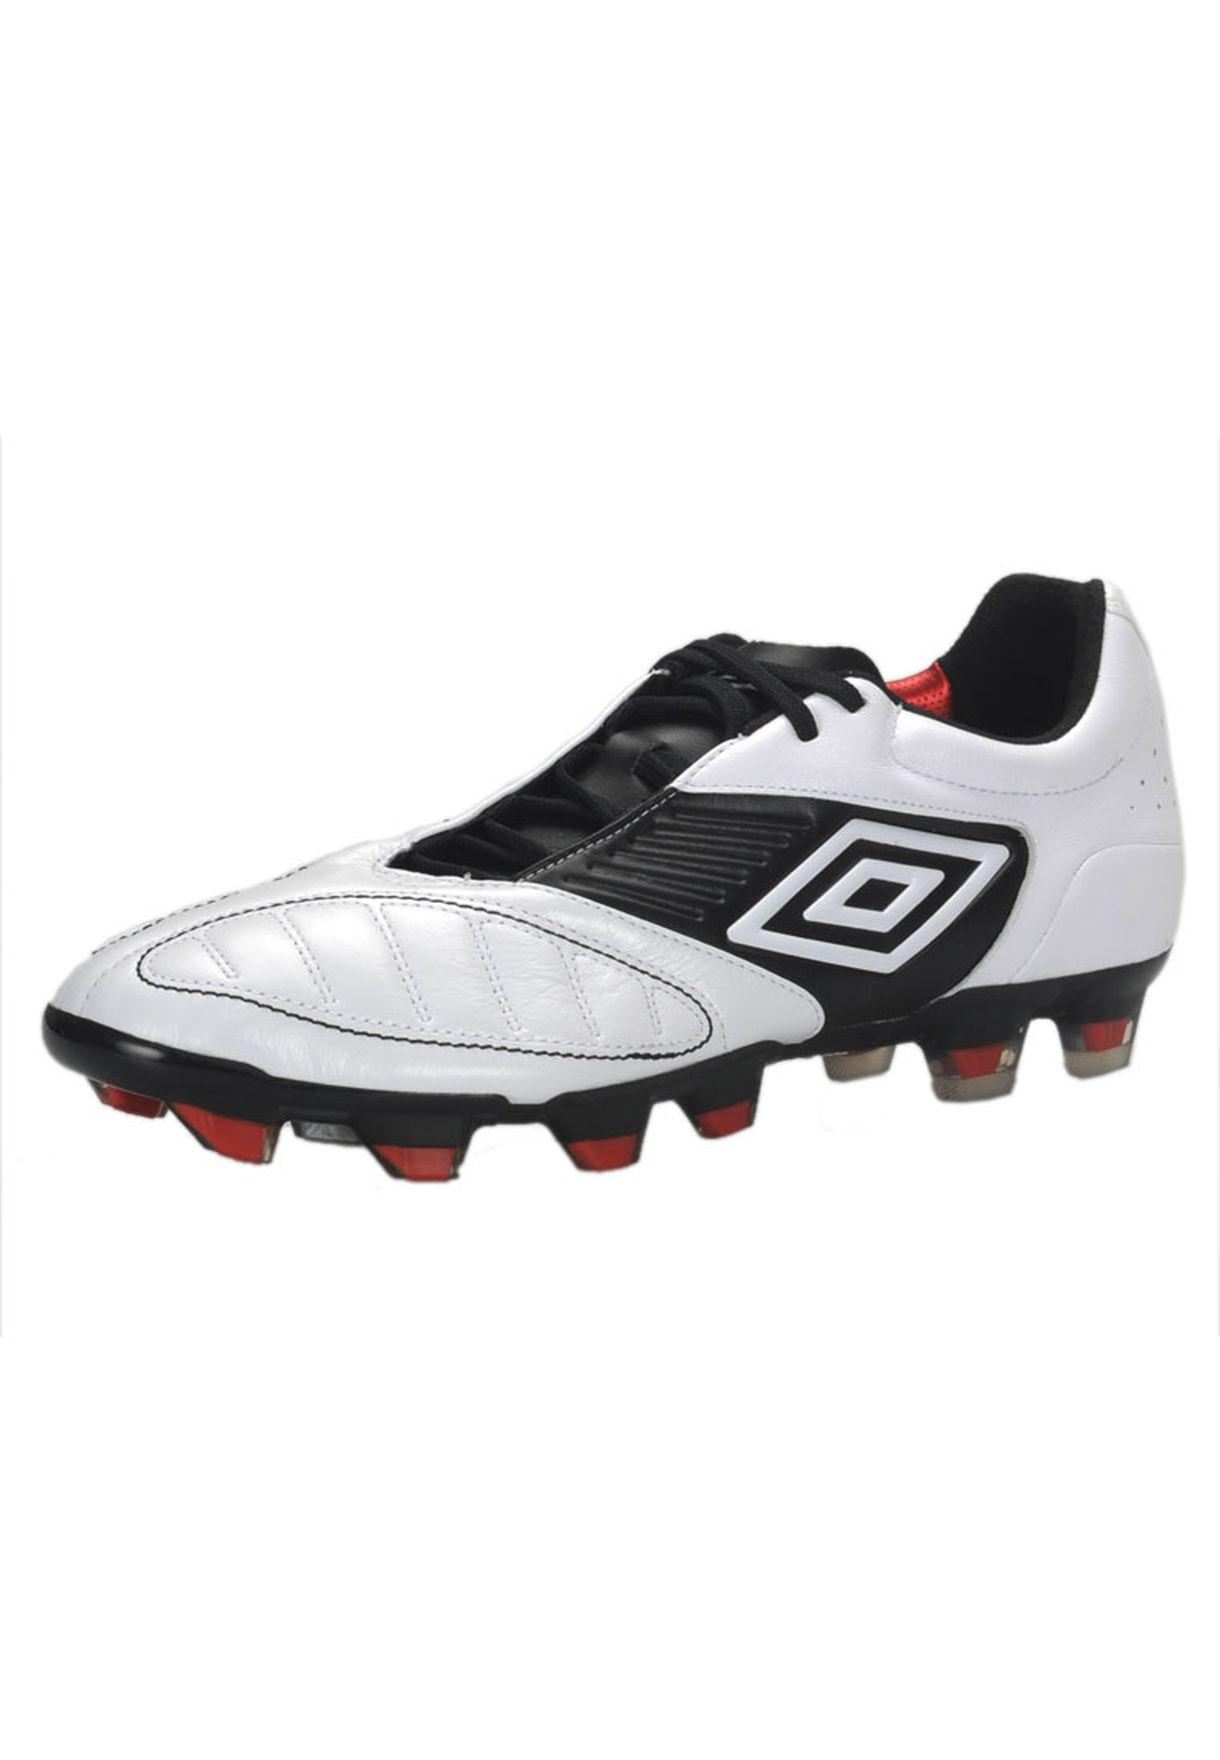 187cb8526d803 تسوق Uywd Football Shoes ماركة امبرو لون أبيض في السعودية - UM027SH14AKZ